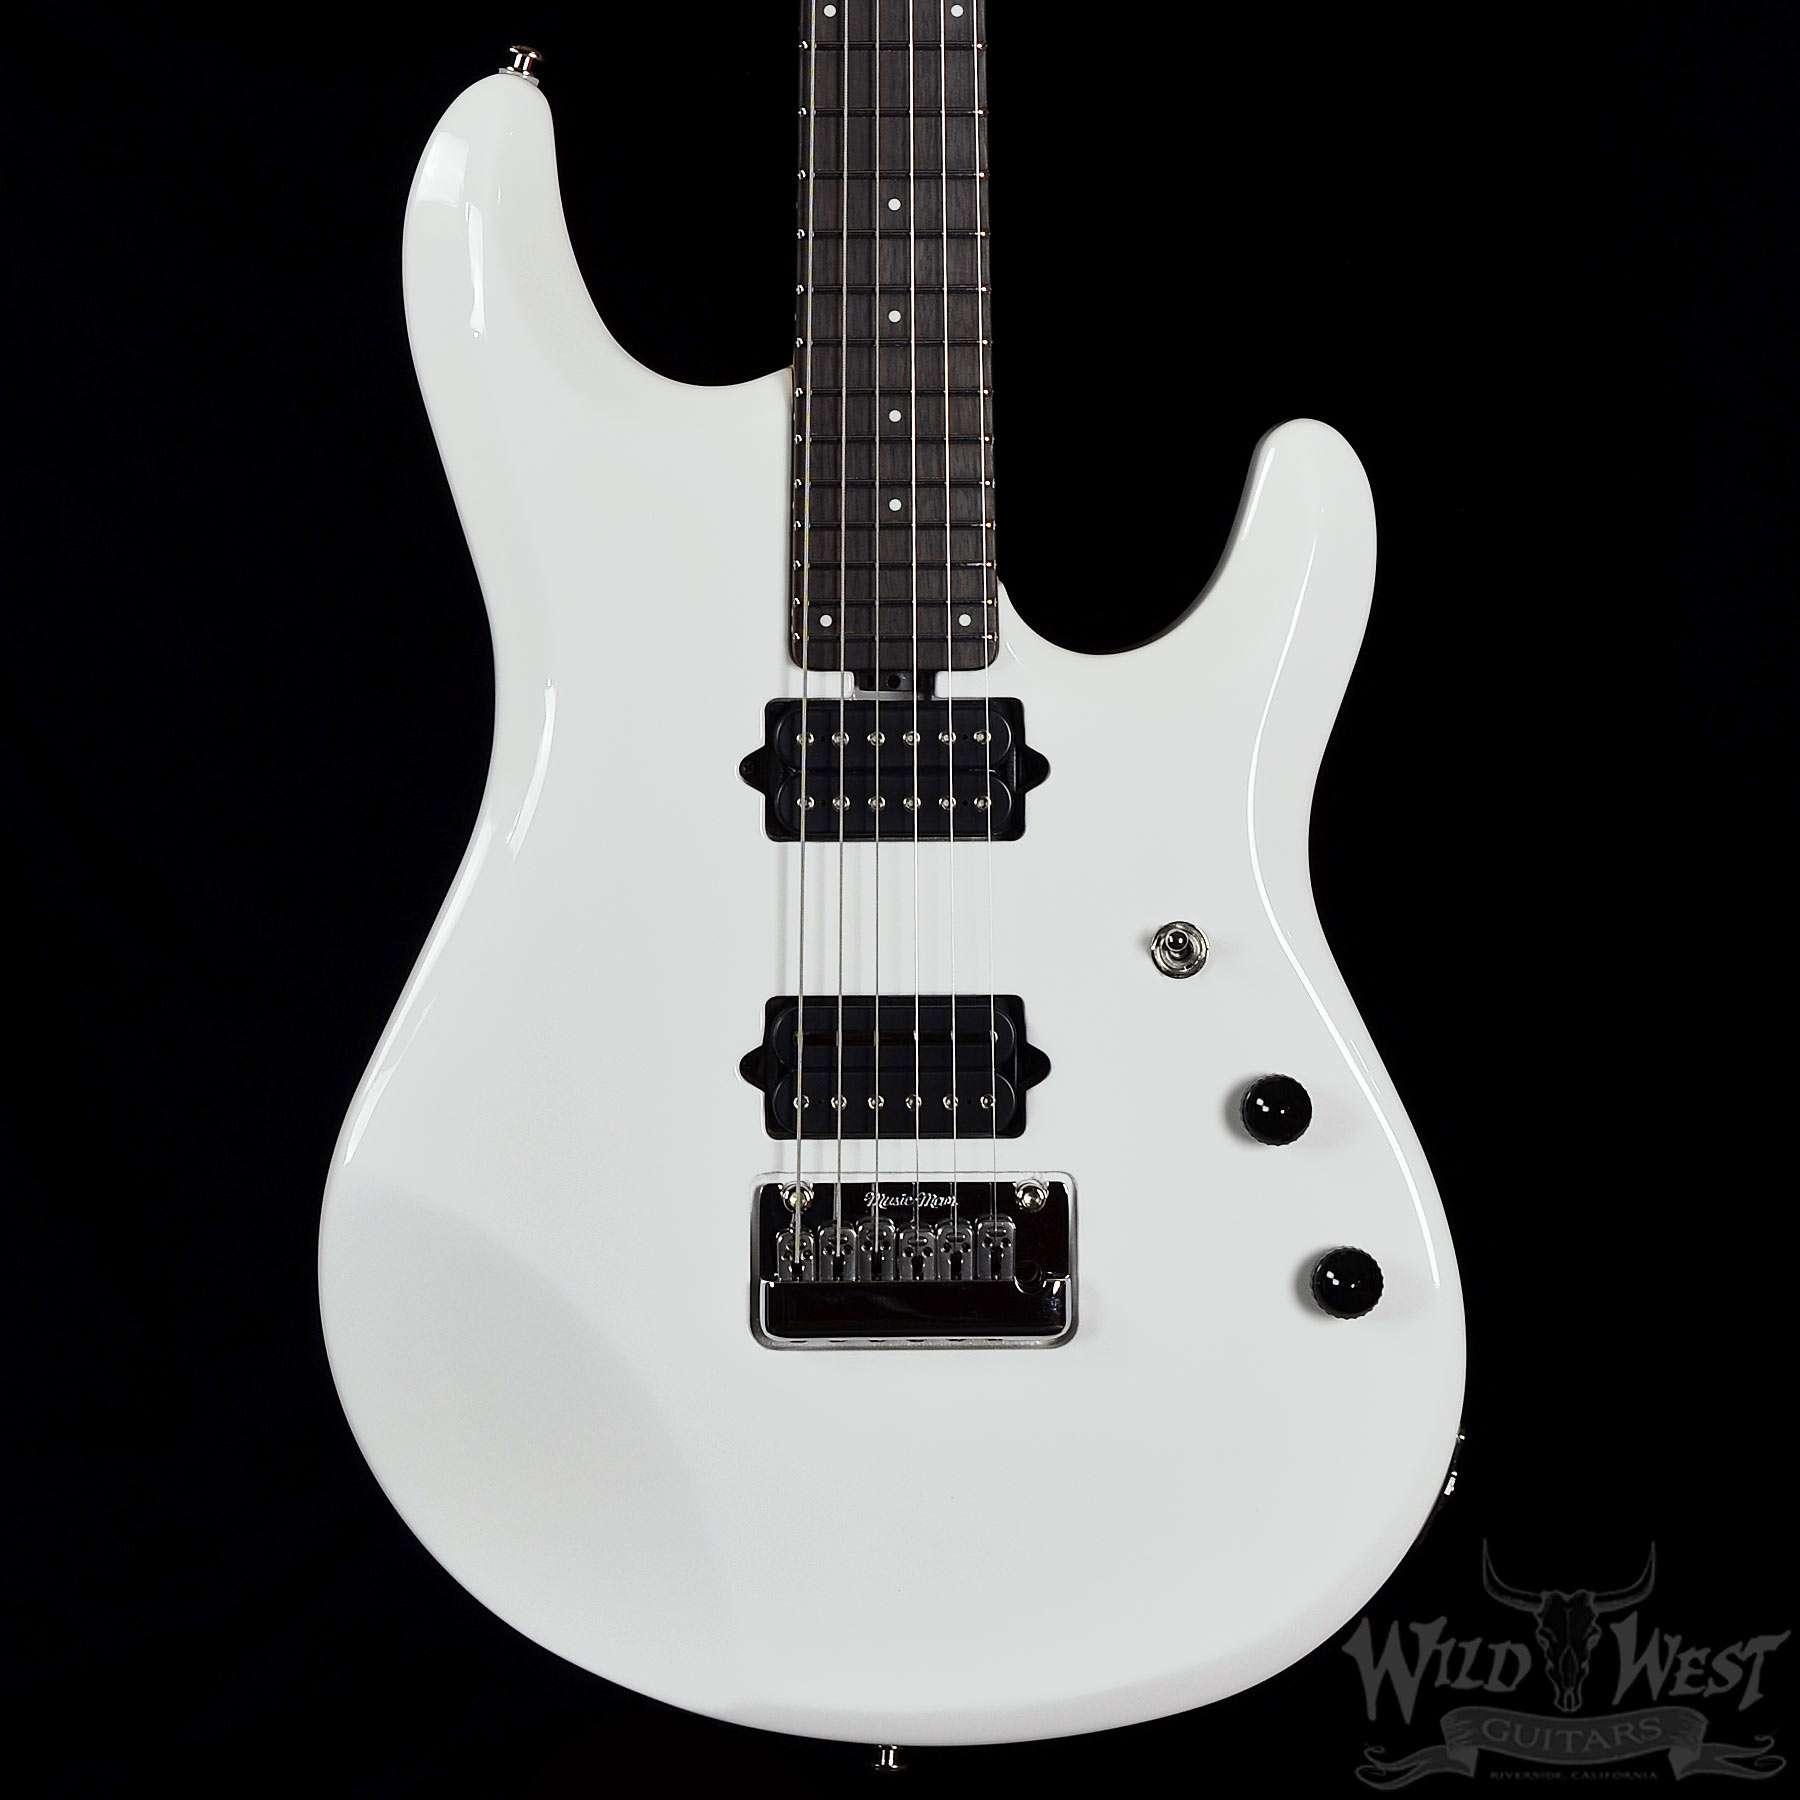 ernie ball music man petrucci jp6 white pearl wild west guitars. Black Bedroom Furniture Sets. Home Design Ideas